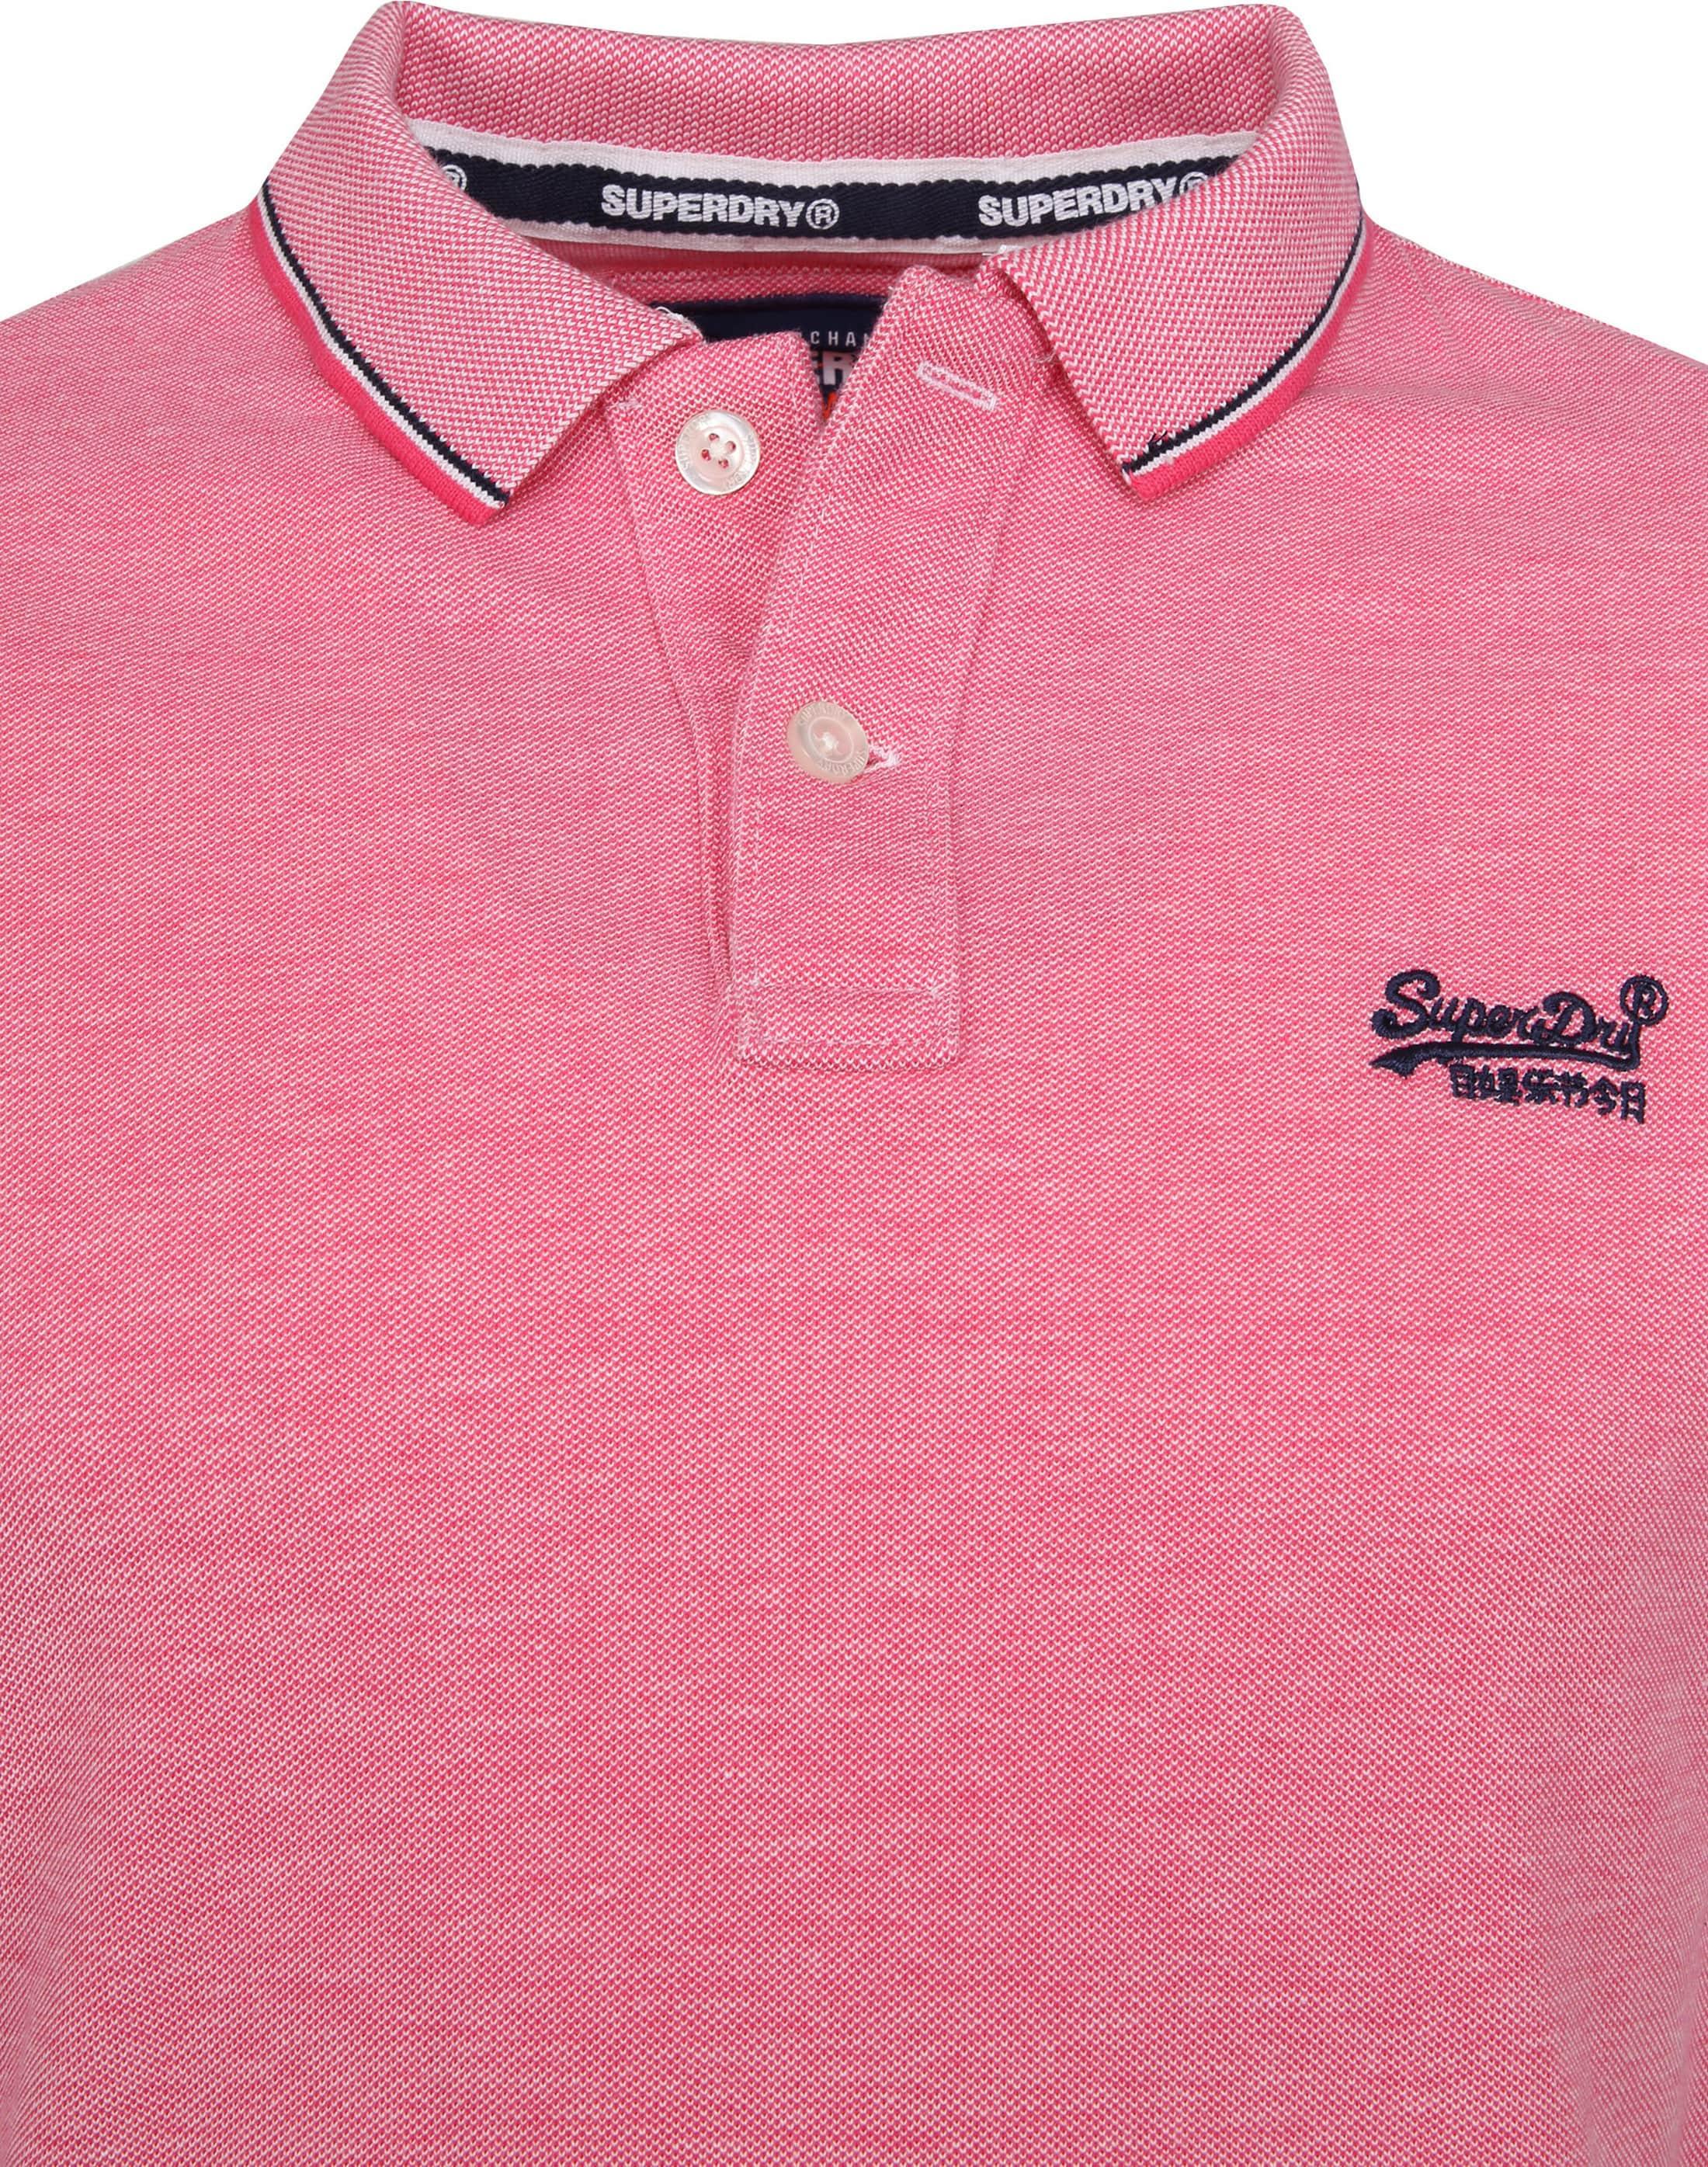 Superdry Premium Polo Pink foto 2